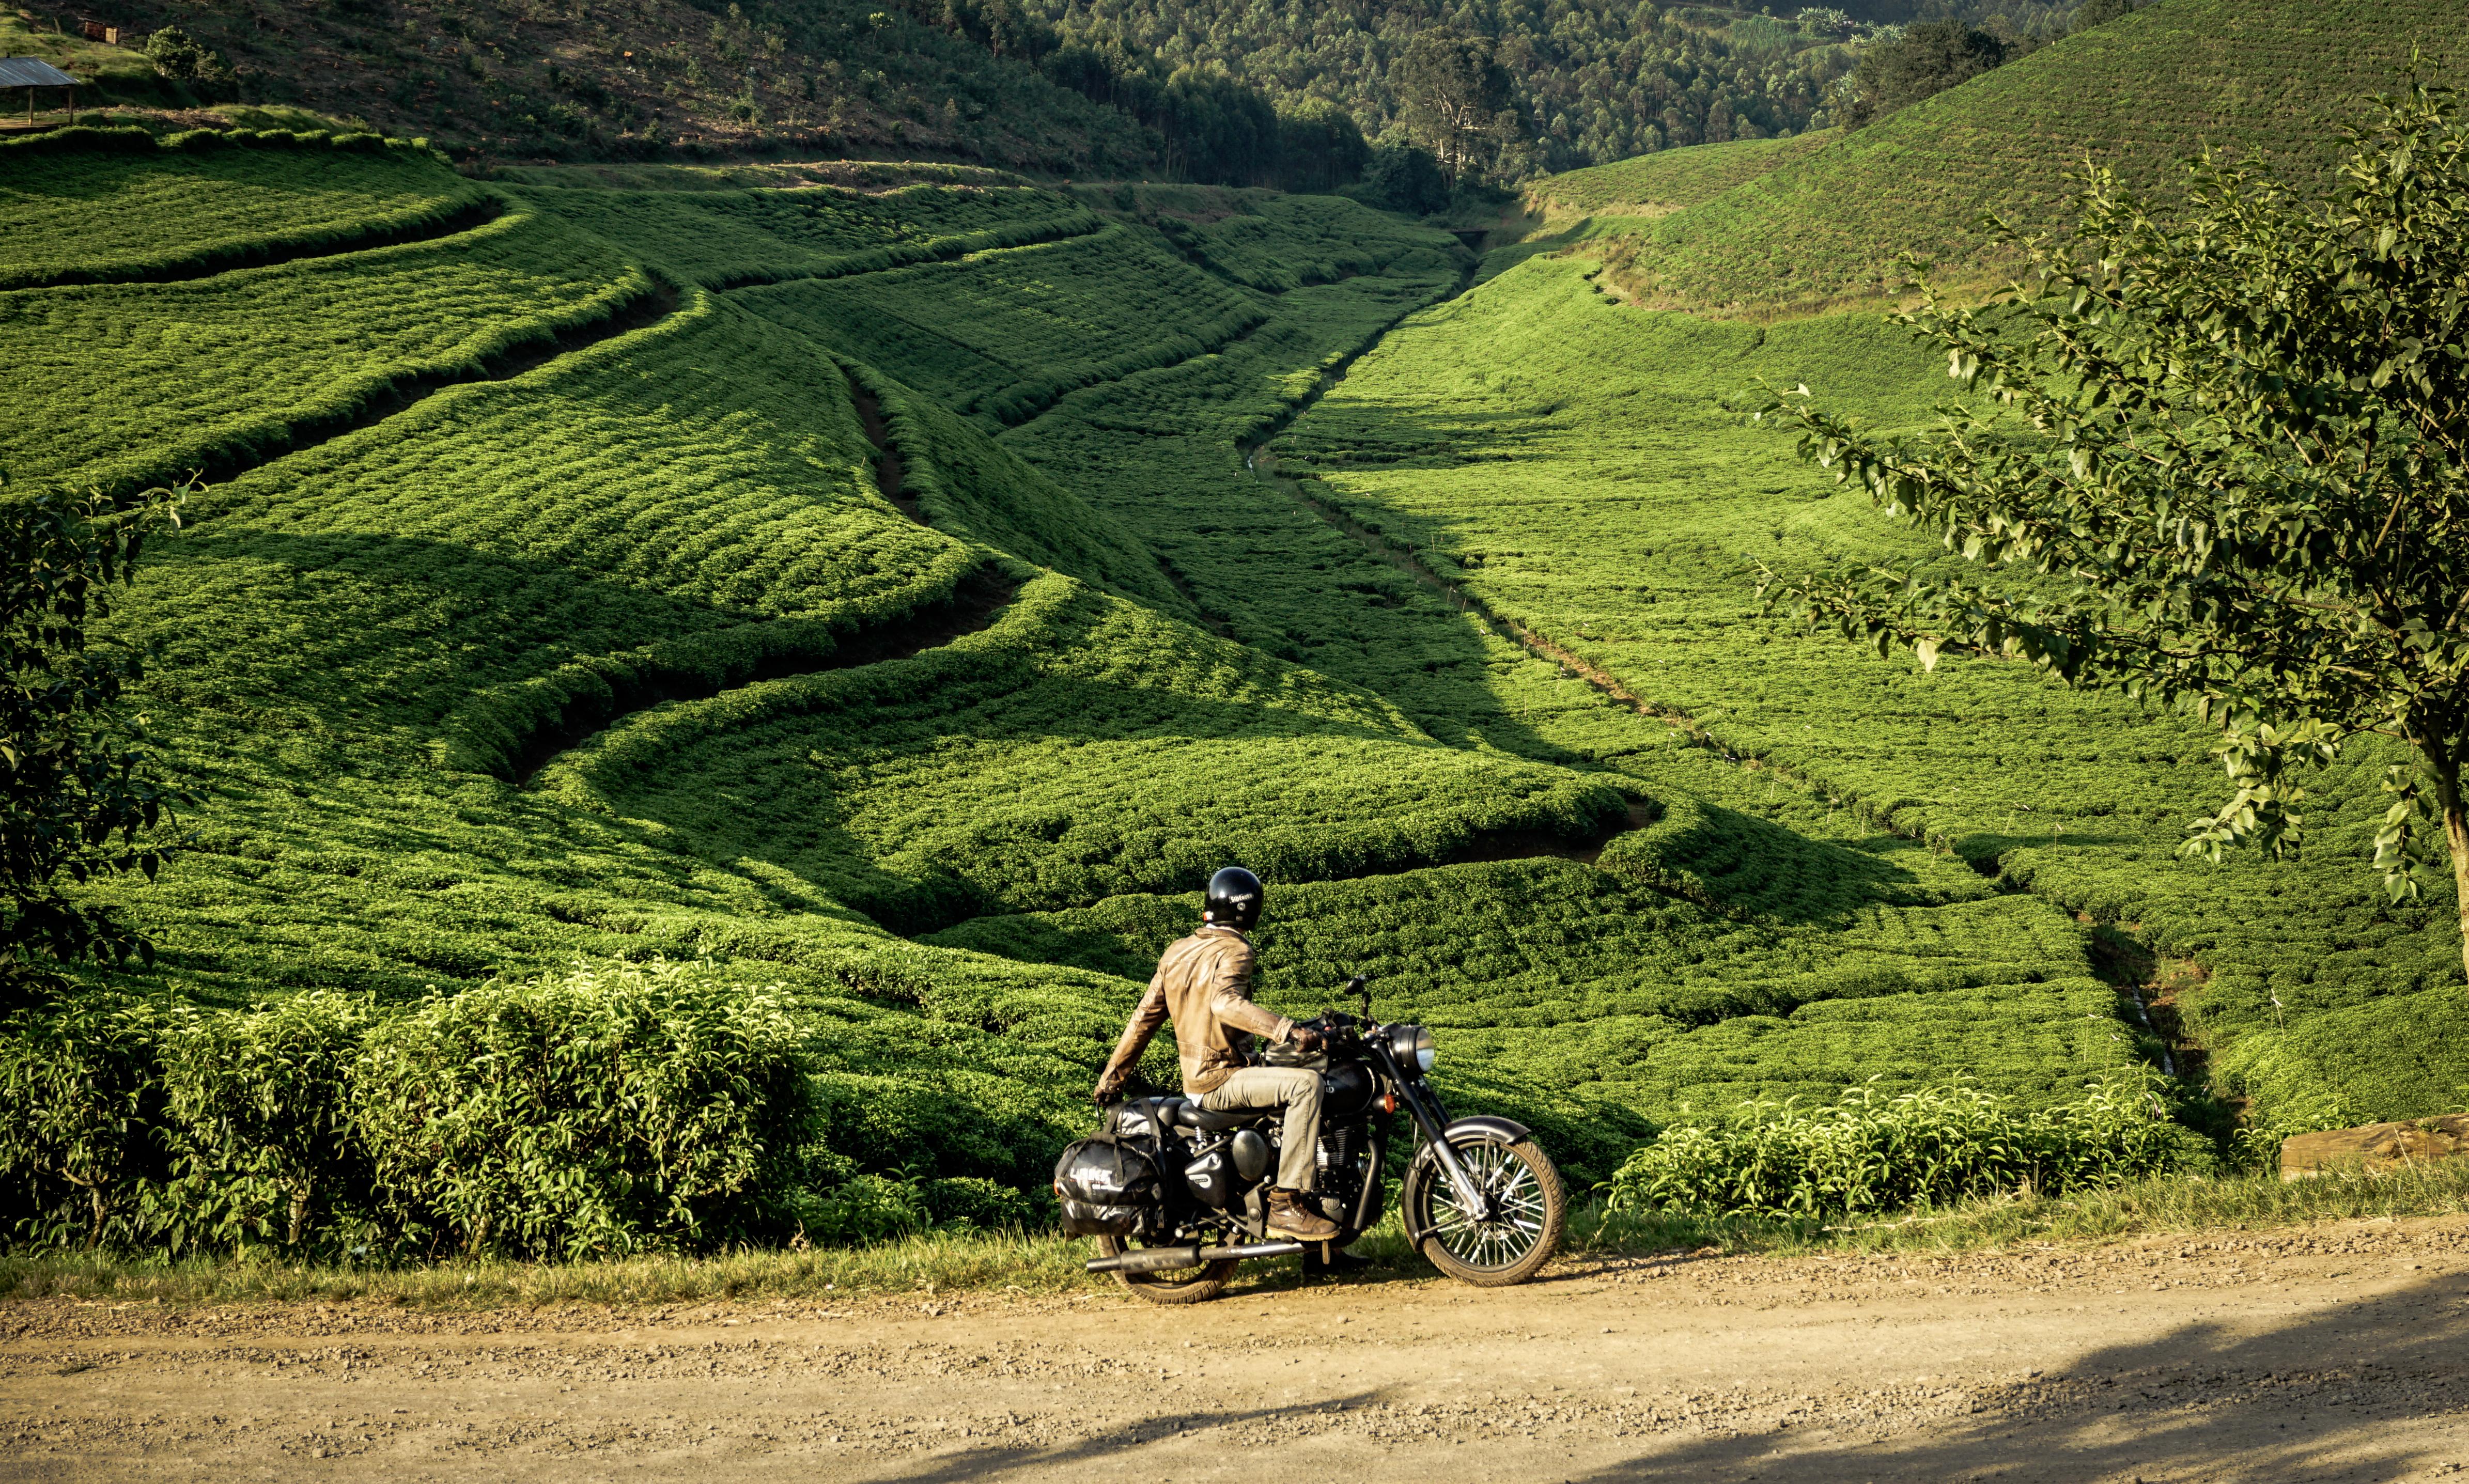 Motorrad-Roadtrip Ruanda - Ruanda: Das Land der tausend Hügel